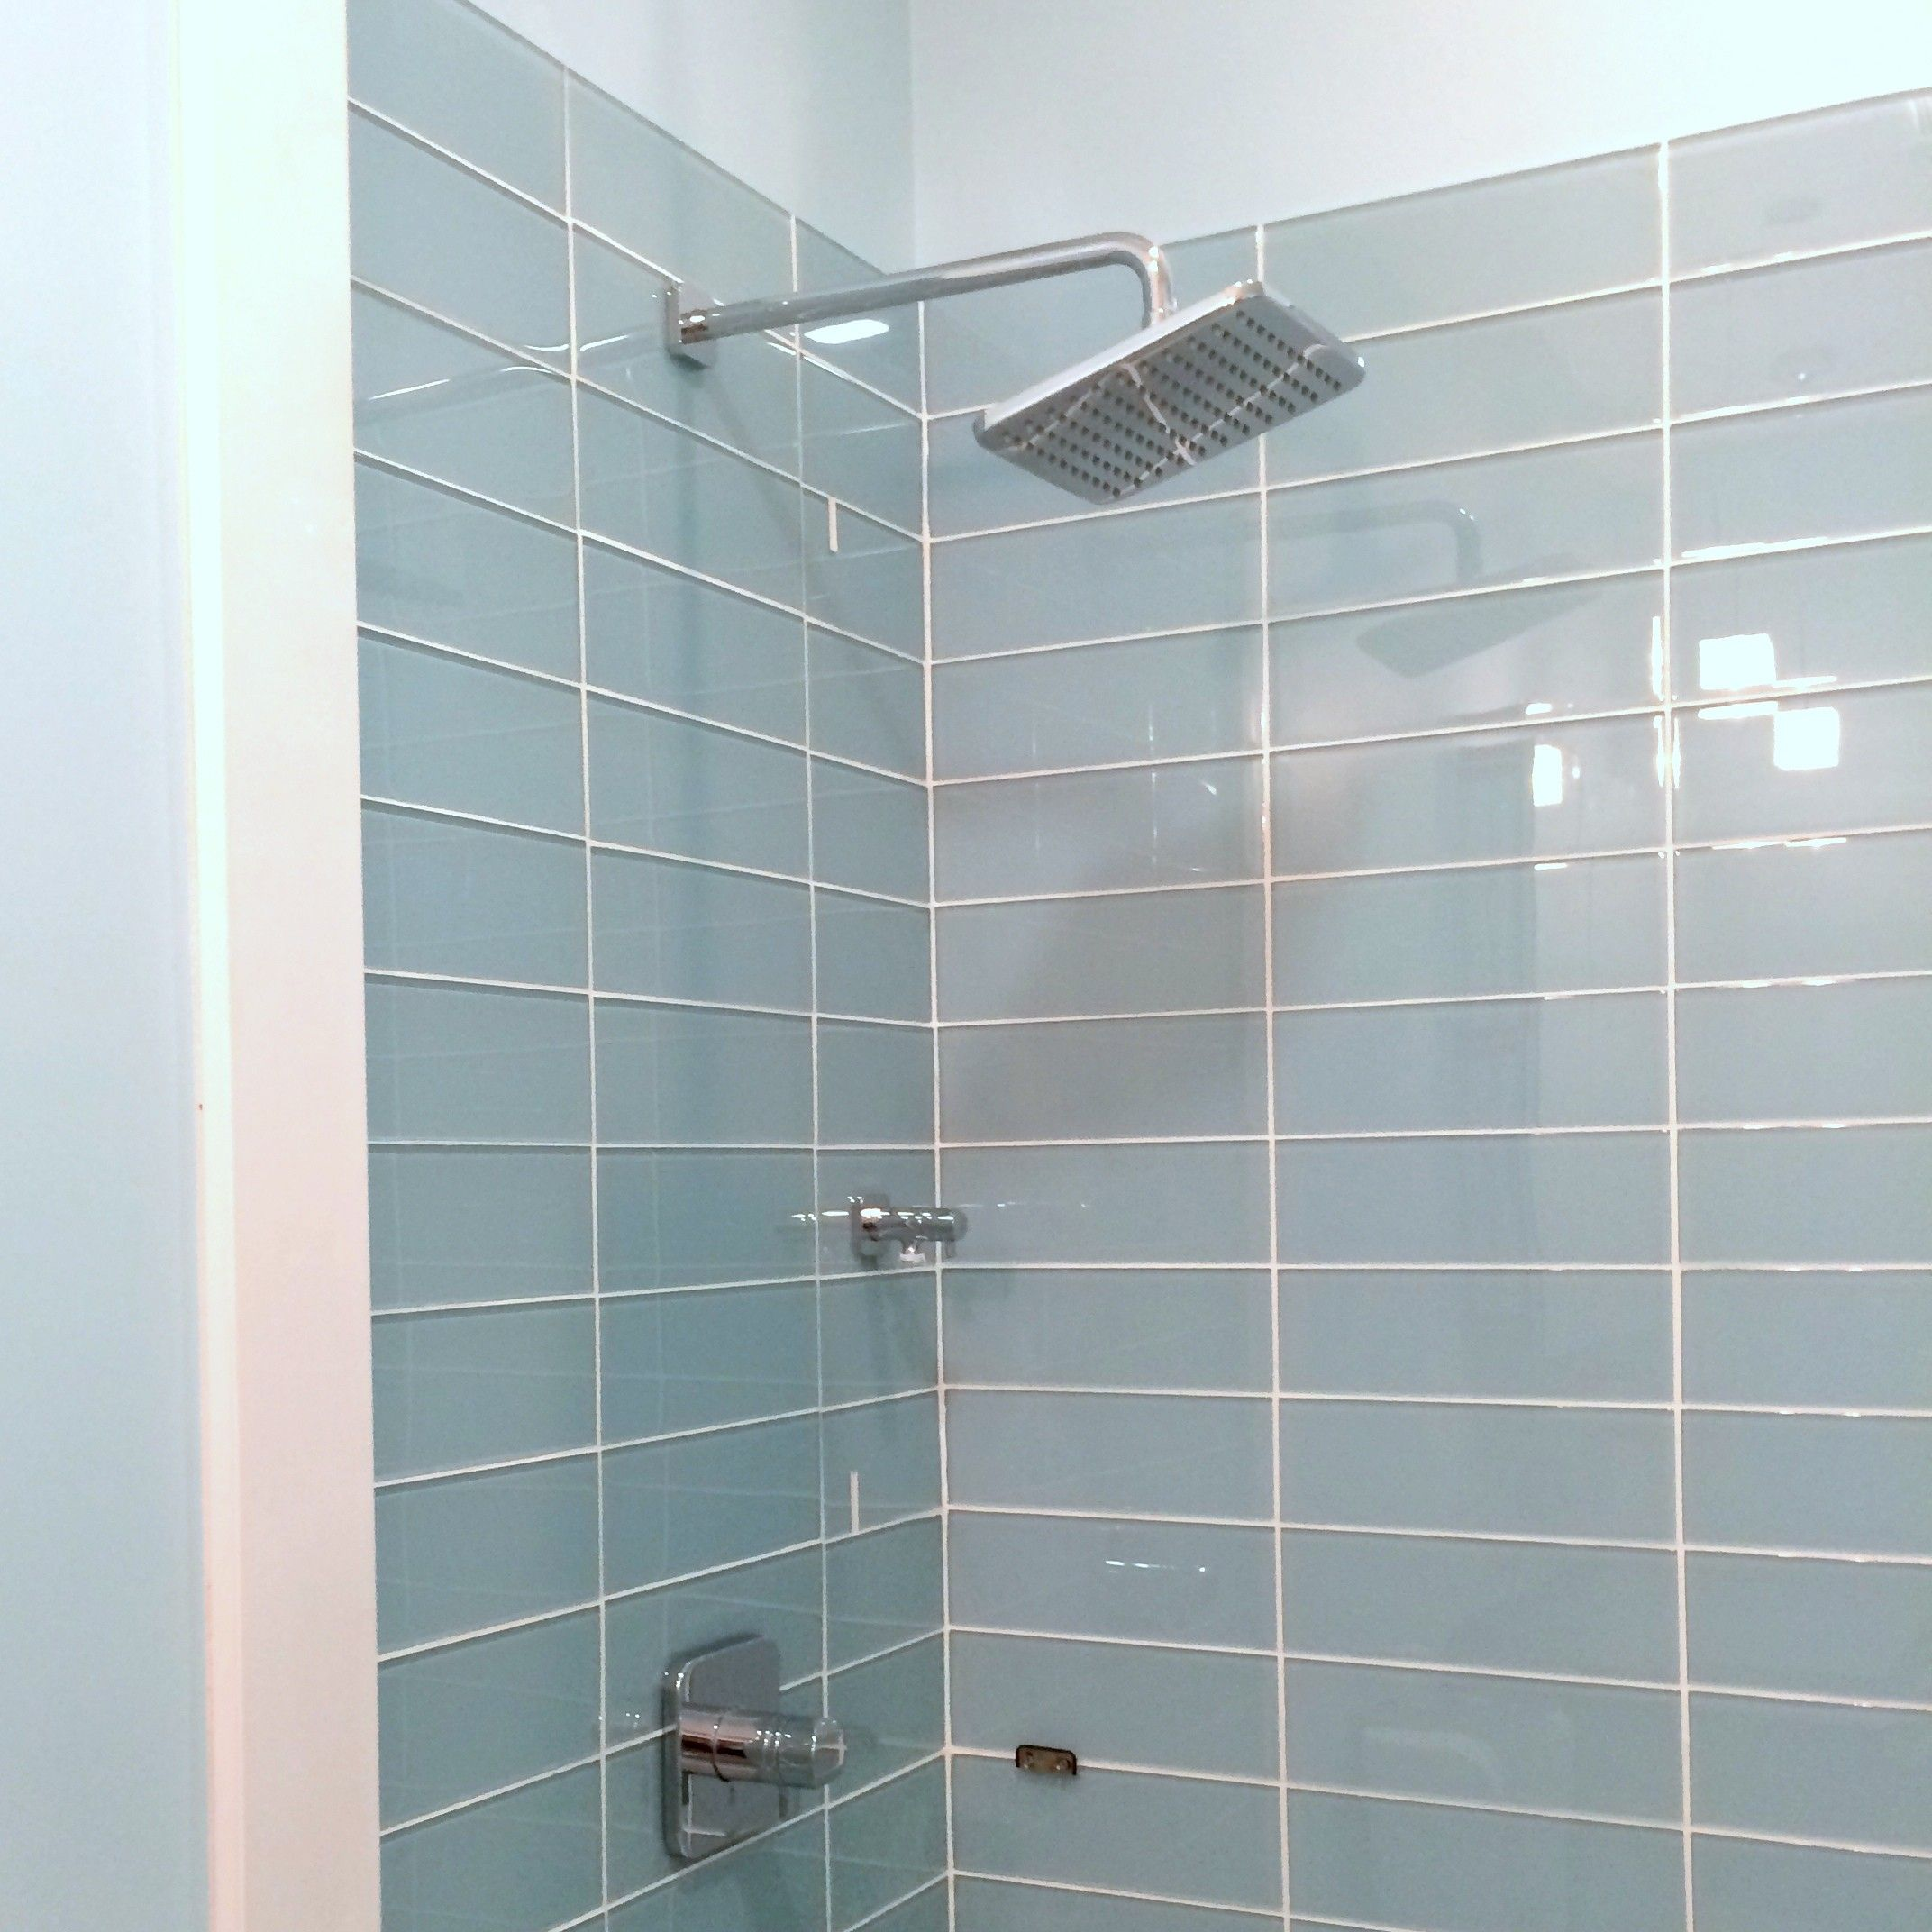 Lush Vapor 4x12 Pale Blue Glass Subway Tile Shower Installation